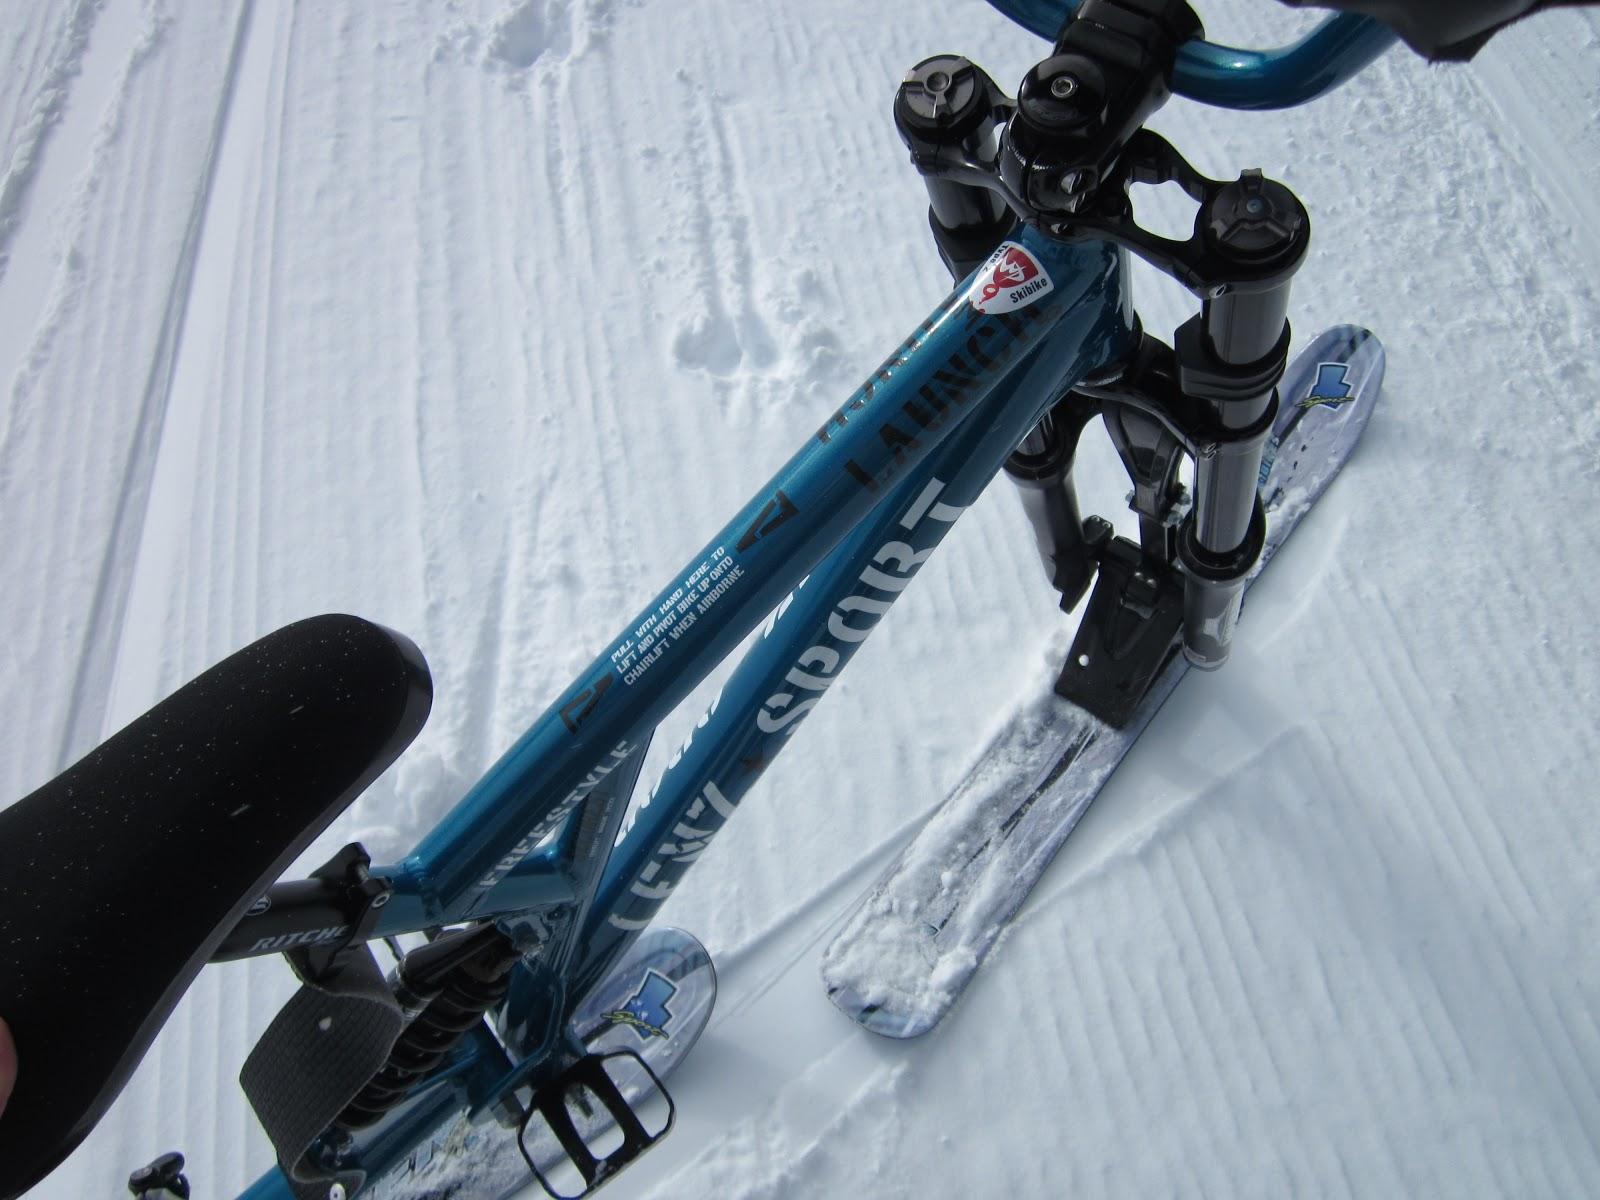 Professional Skibike Instruction